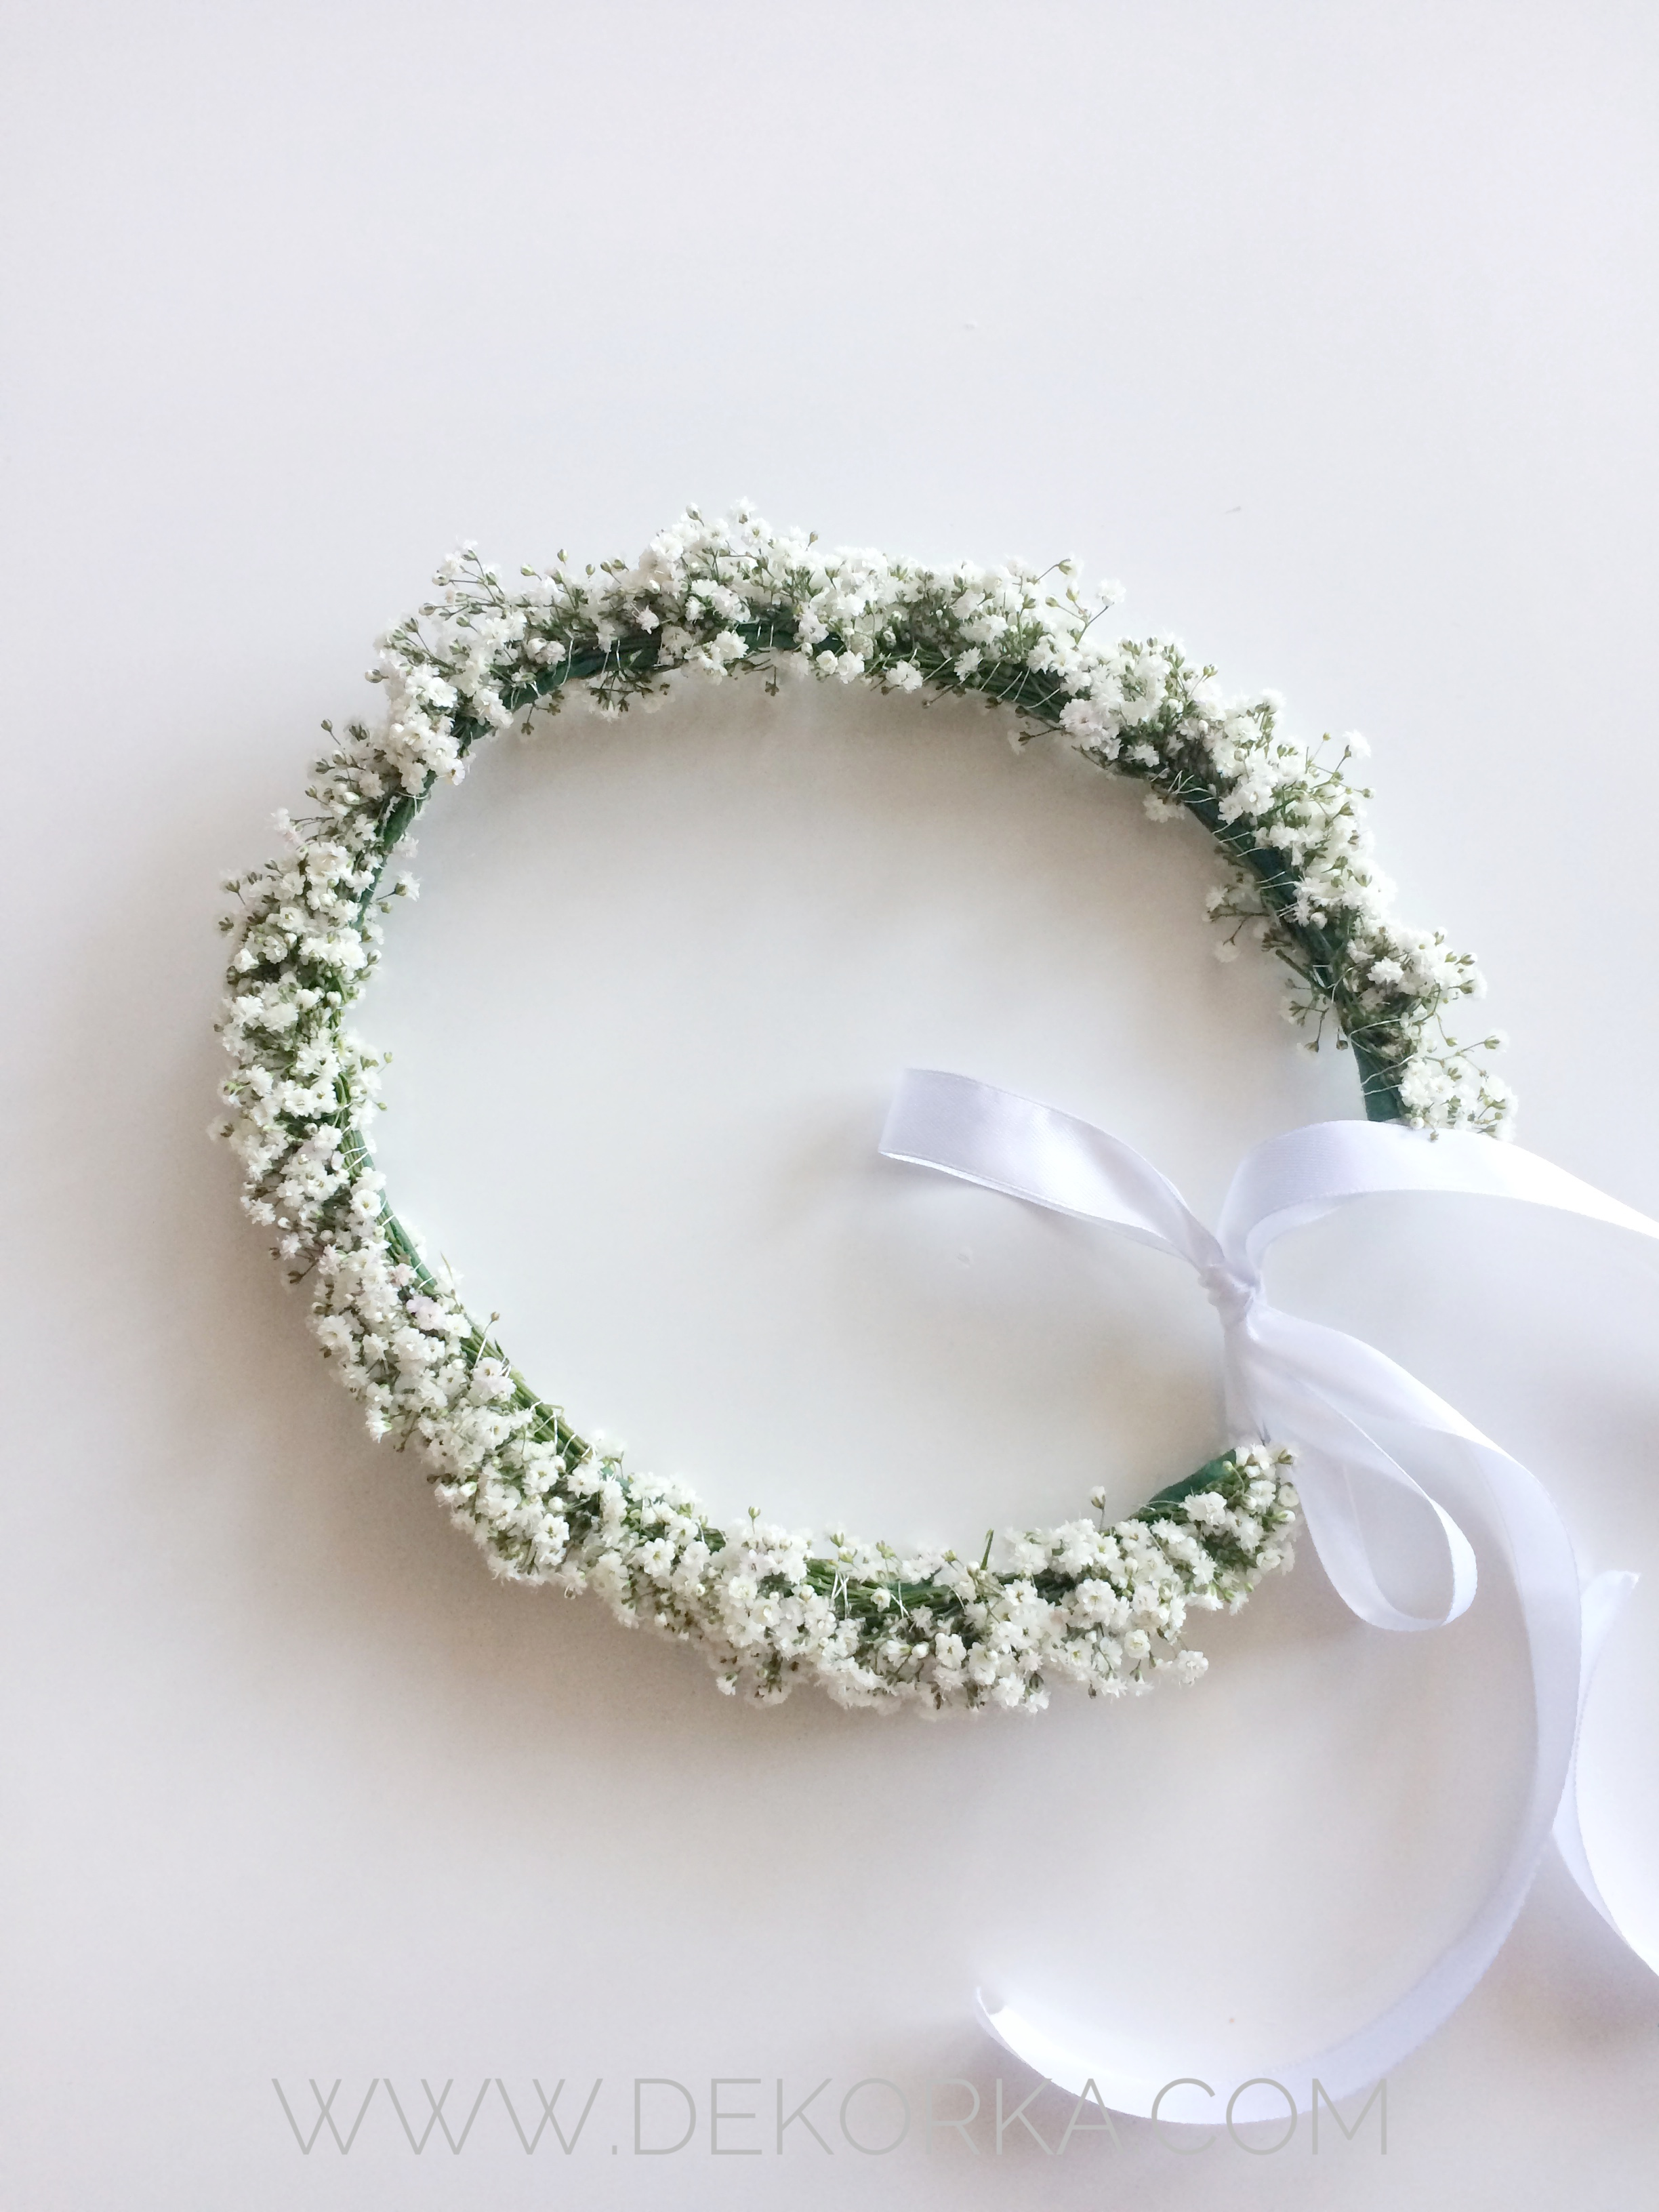 dekorka.com dekoratorki wesele ślub ślask